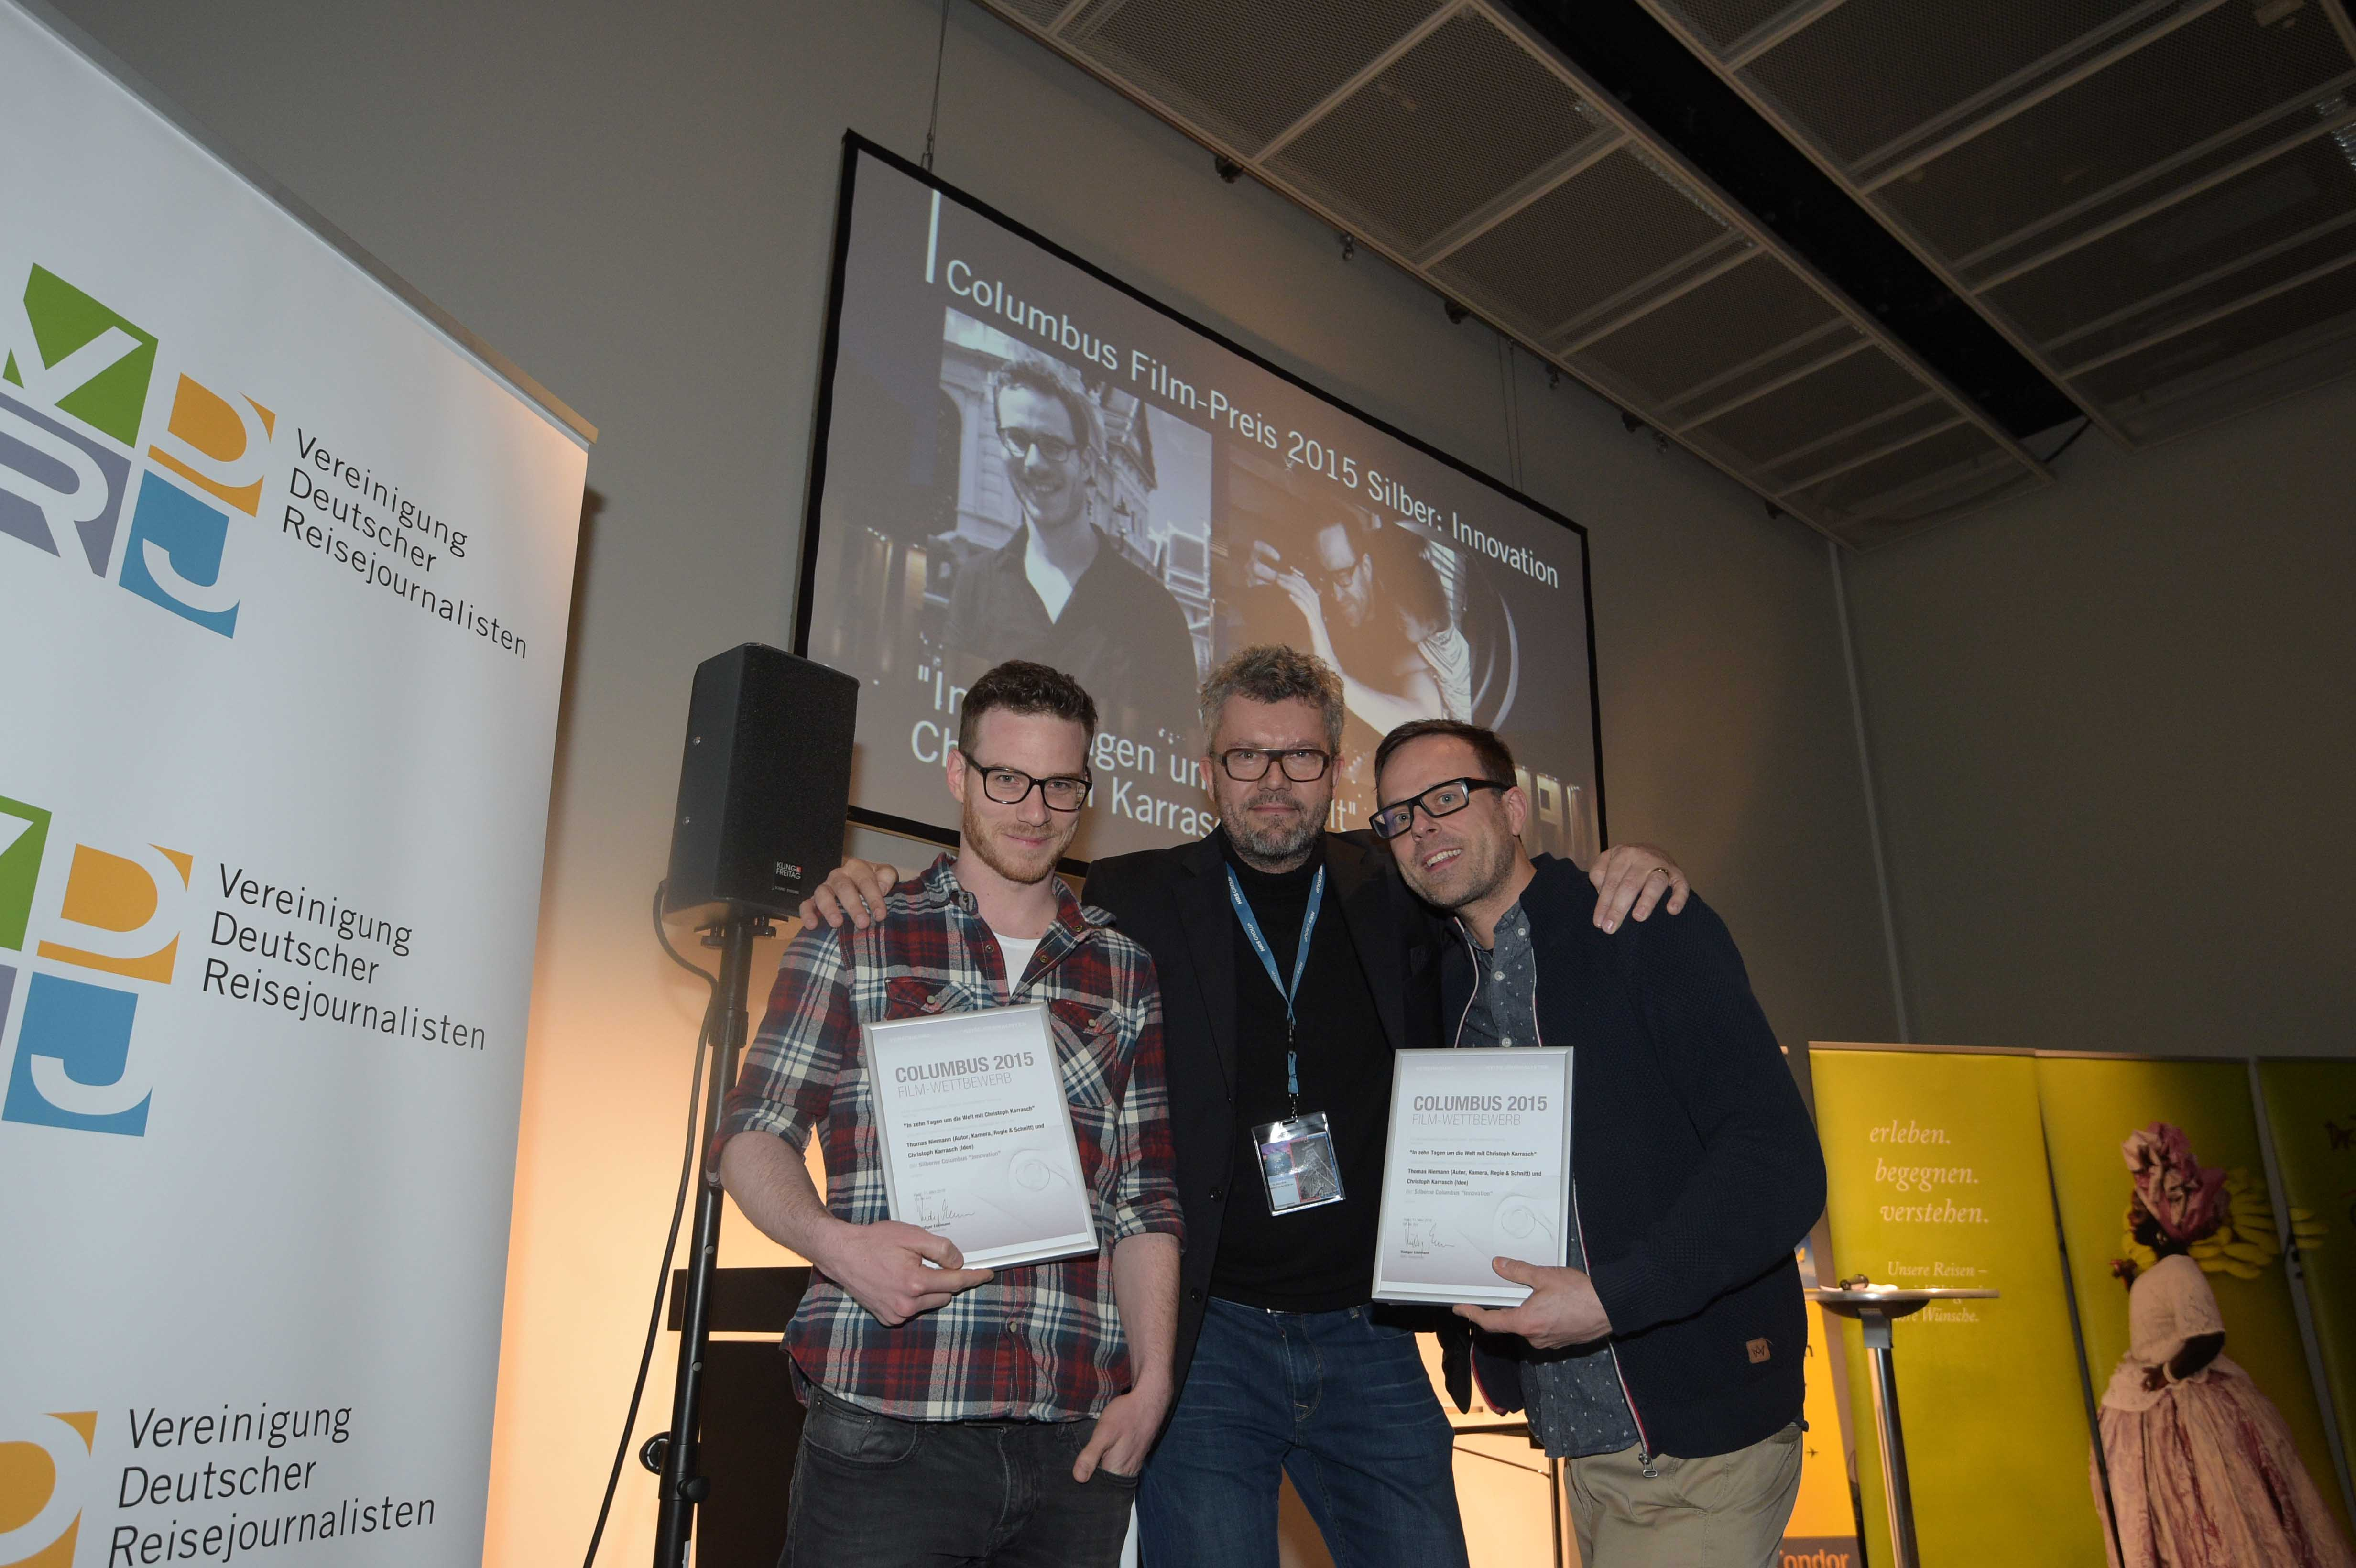 Columbus Film Preis 2015 Silber Innovation Christoph Karrasch und Thomas Niemann mit Thomas Radler web